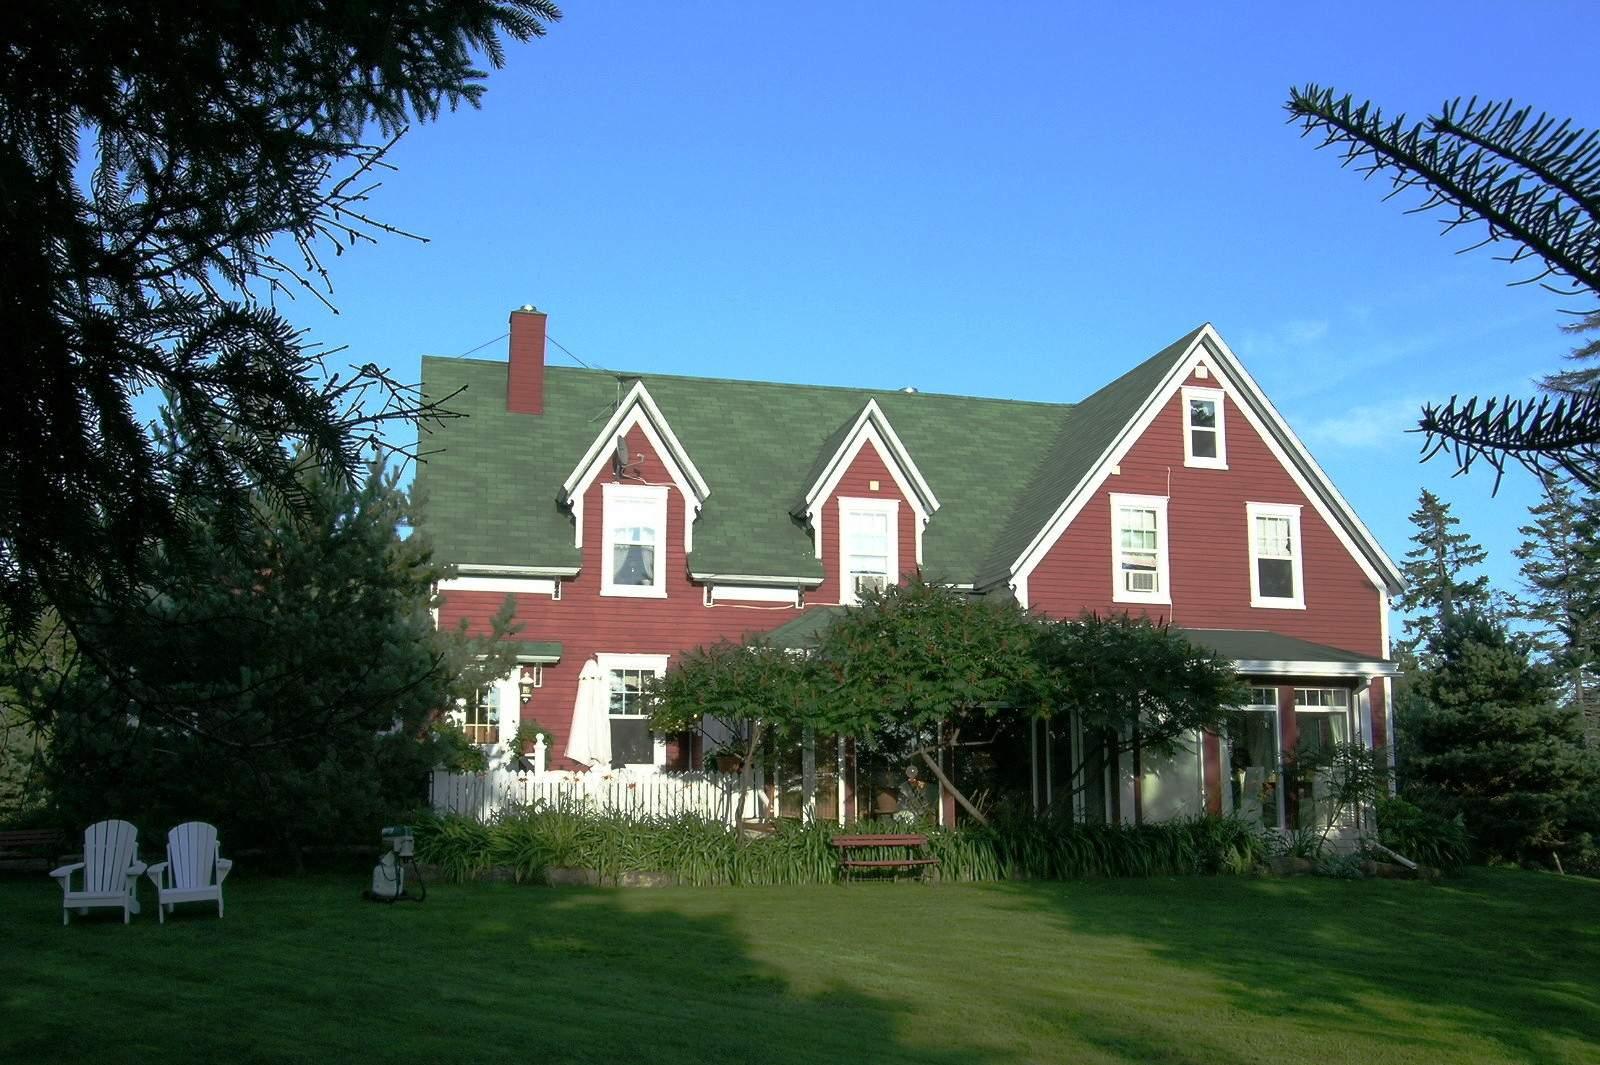 Little Shemogue Country Inn